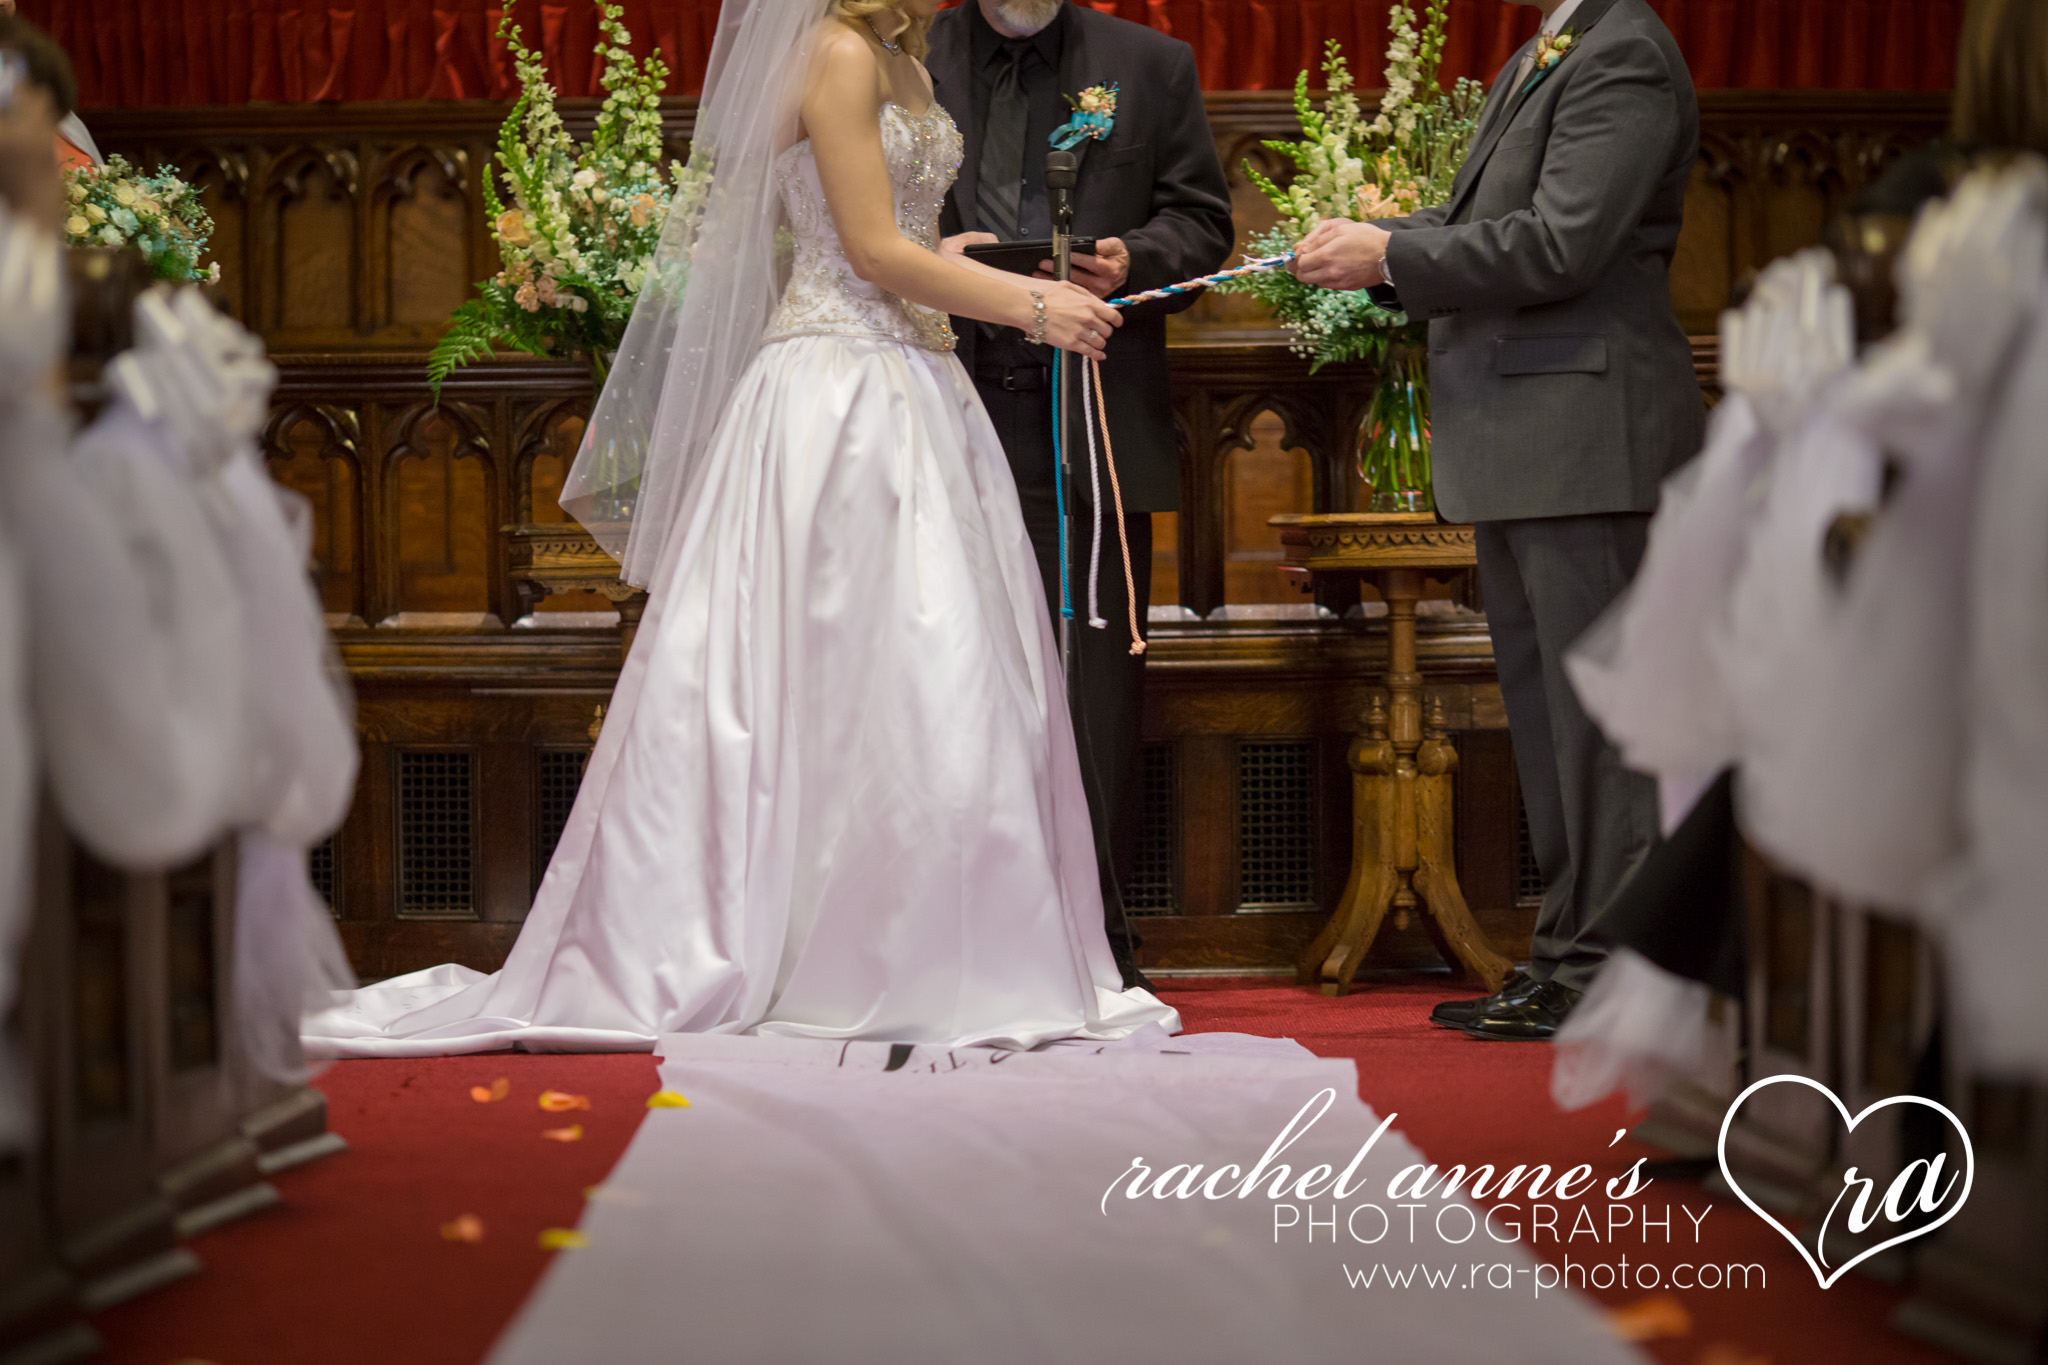 024-JKS-WEDDINGS-THE-FRANKLIN-PA.jpg